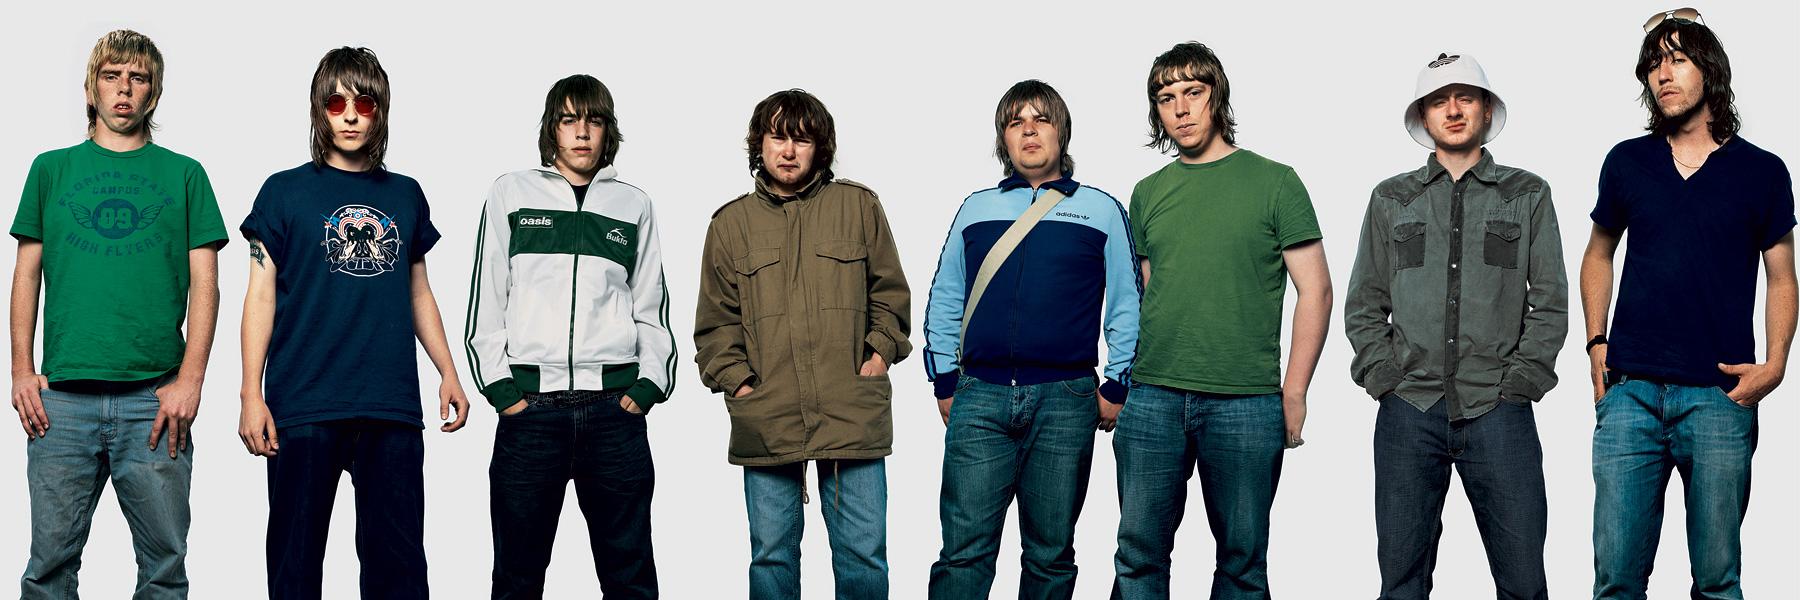 Oasis 12 Музыка нас связала